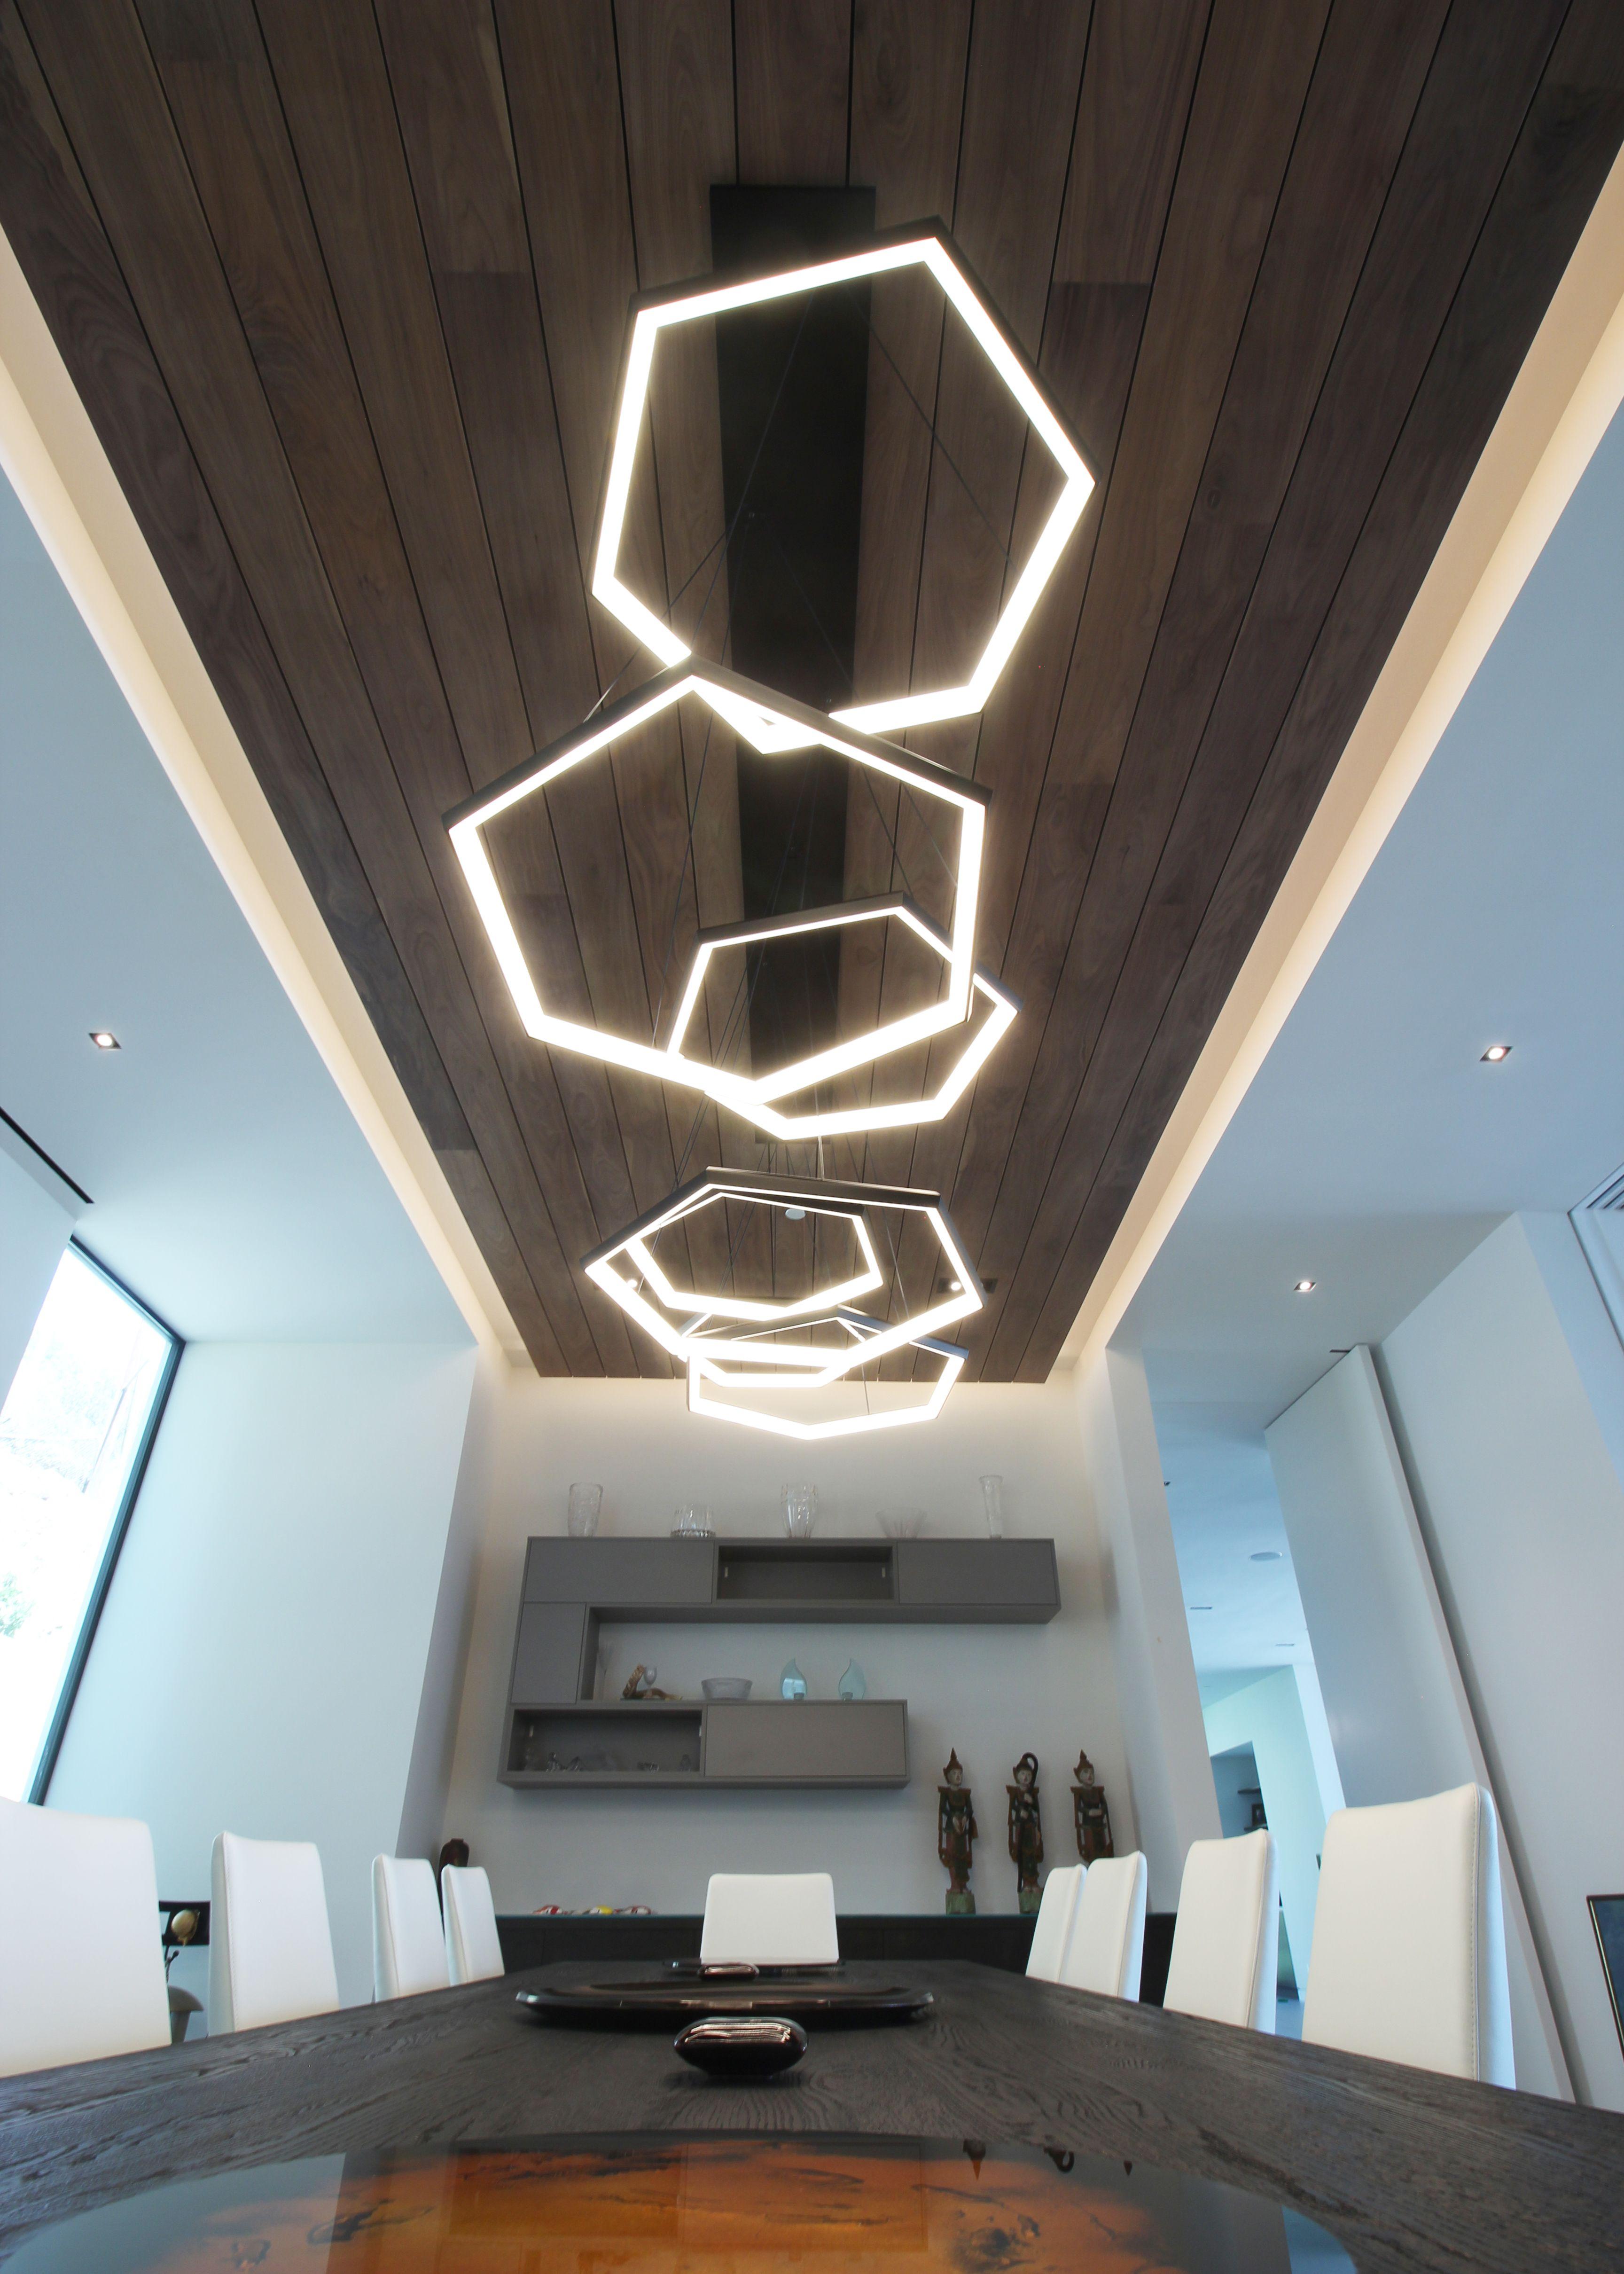 Endo Room Design: Custom Fixture By Studio Endo. Installed In Beverly Hills